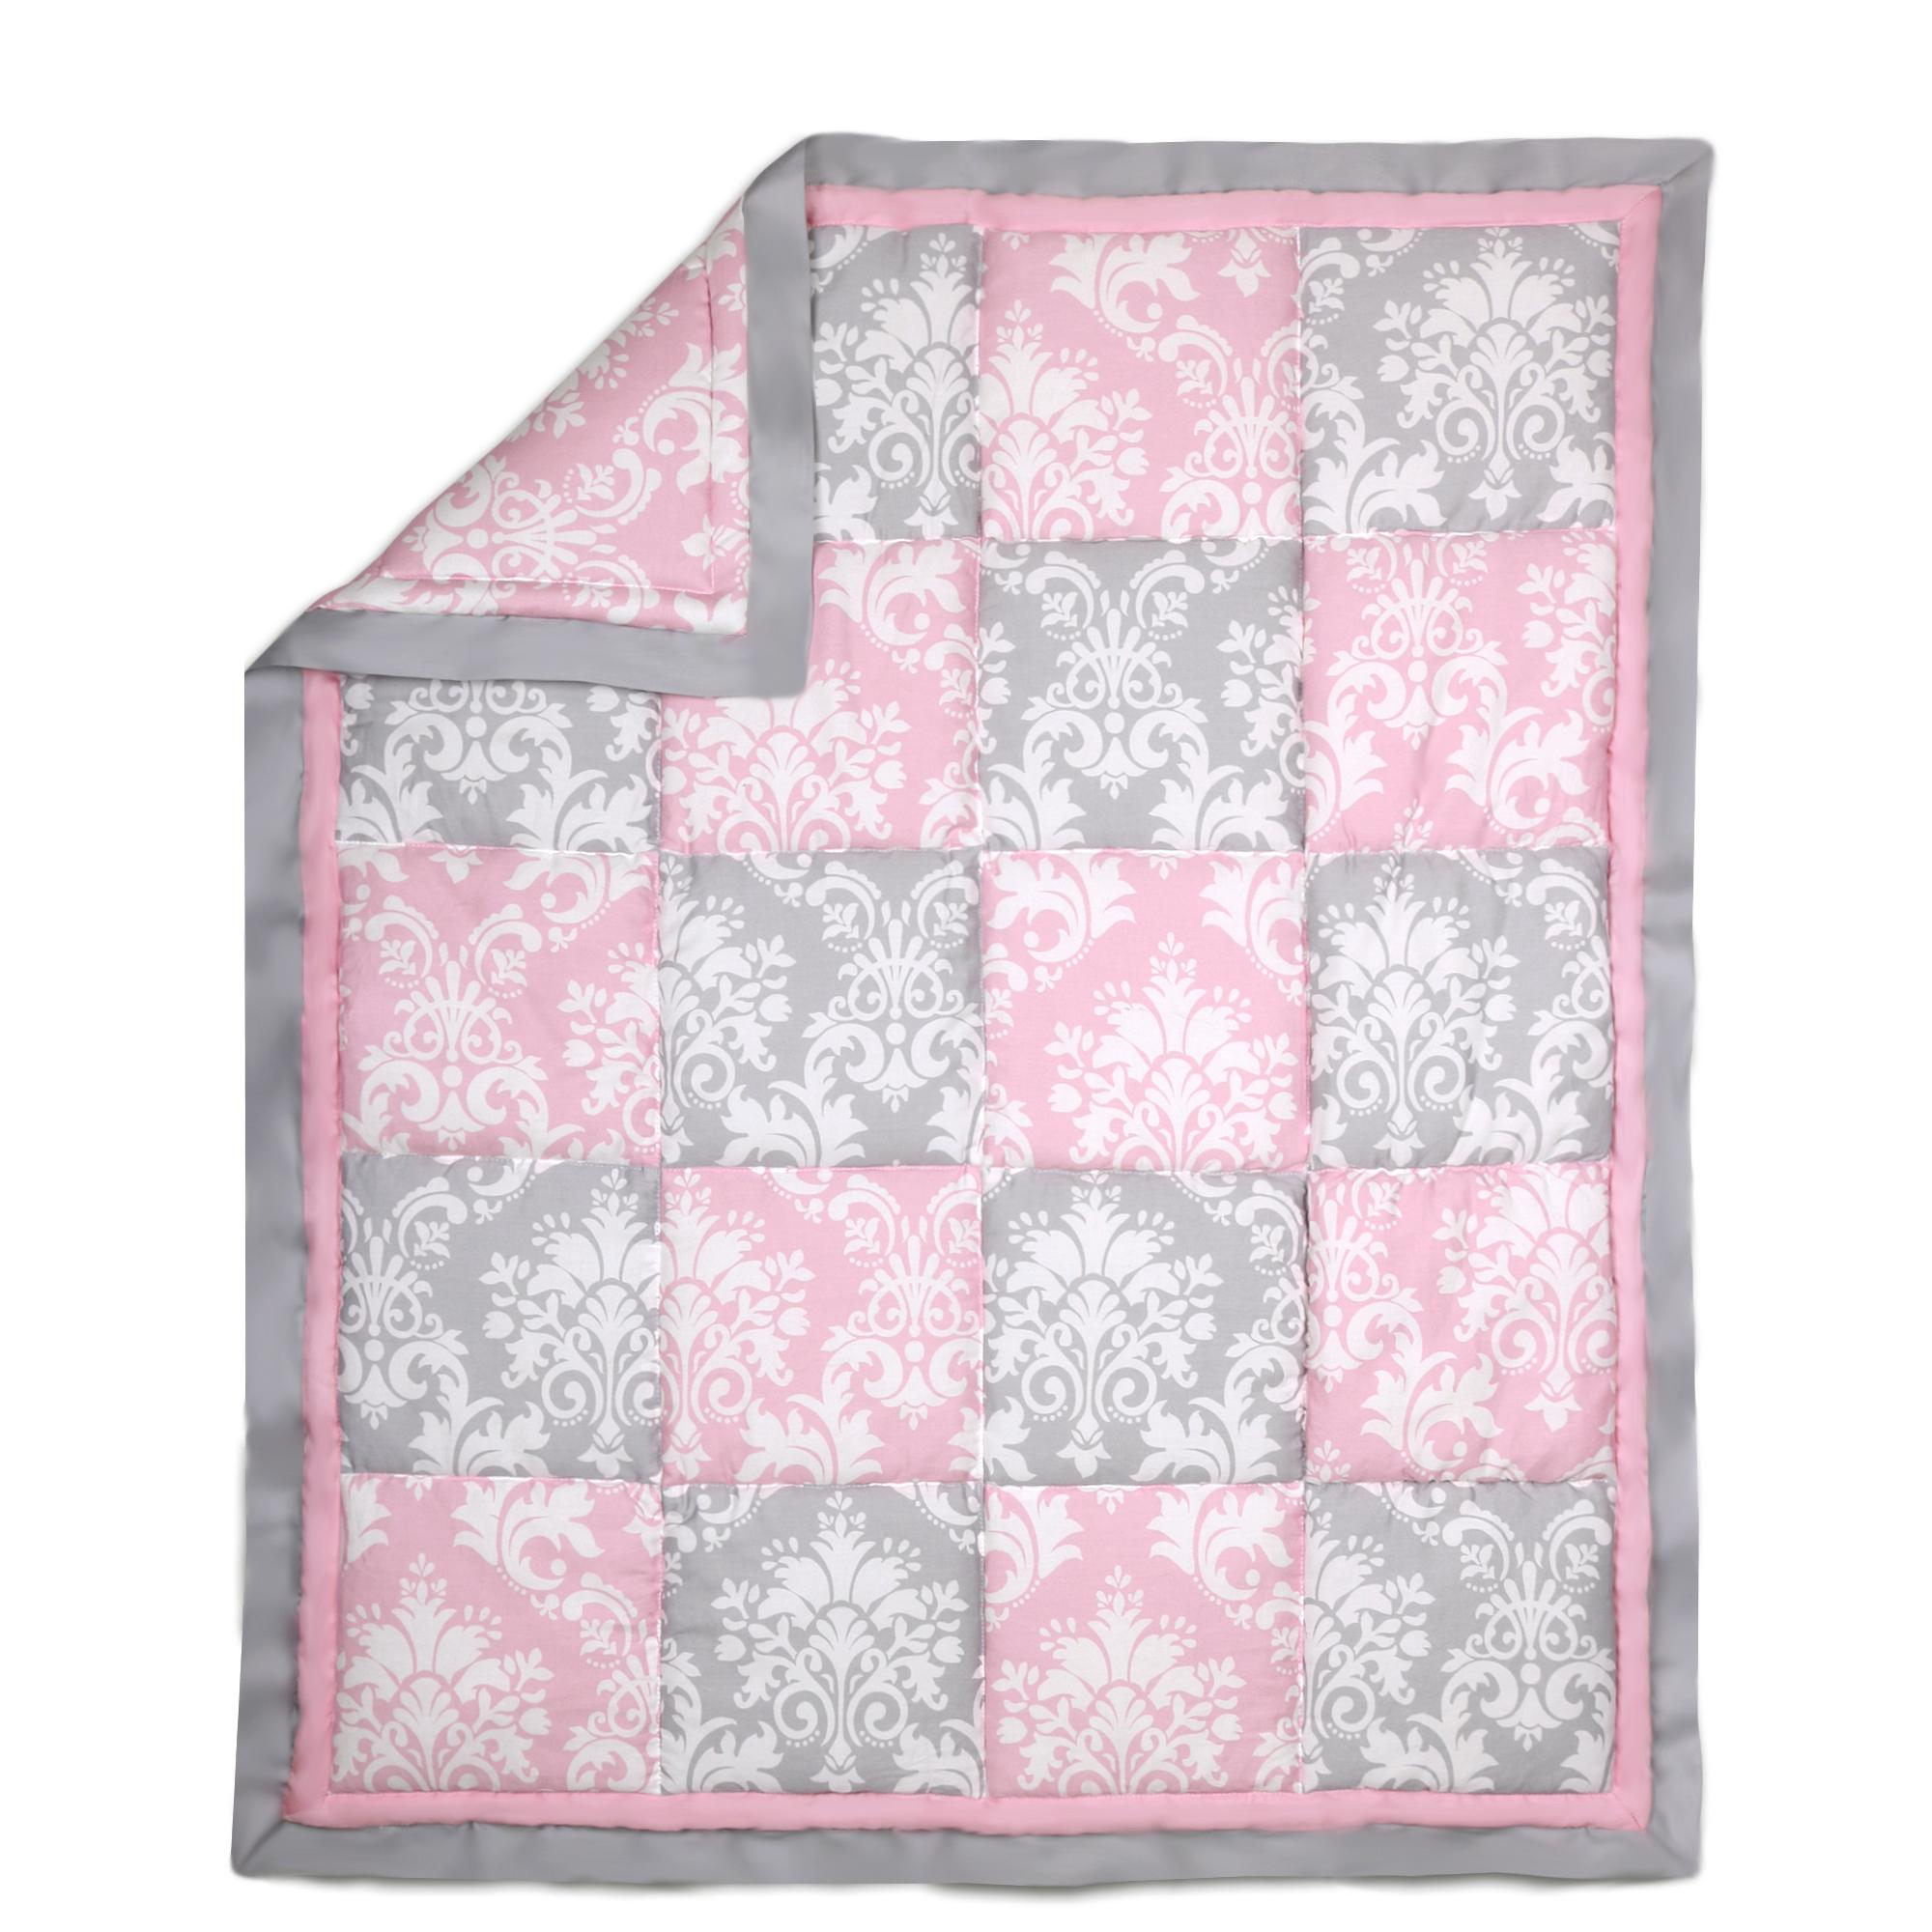 Theme: Damask : pink patchwork quilts - Adamdwight.com